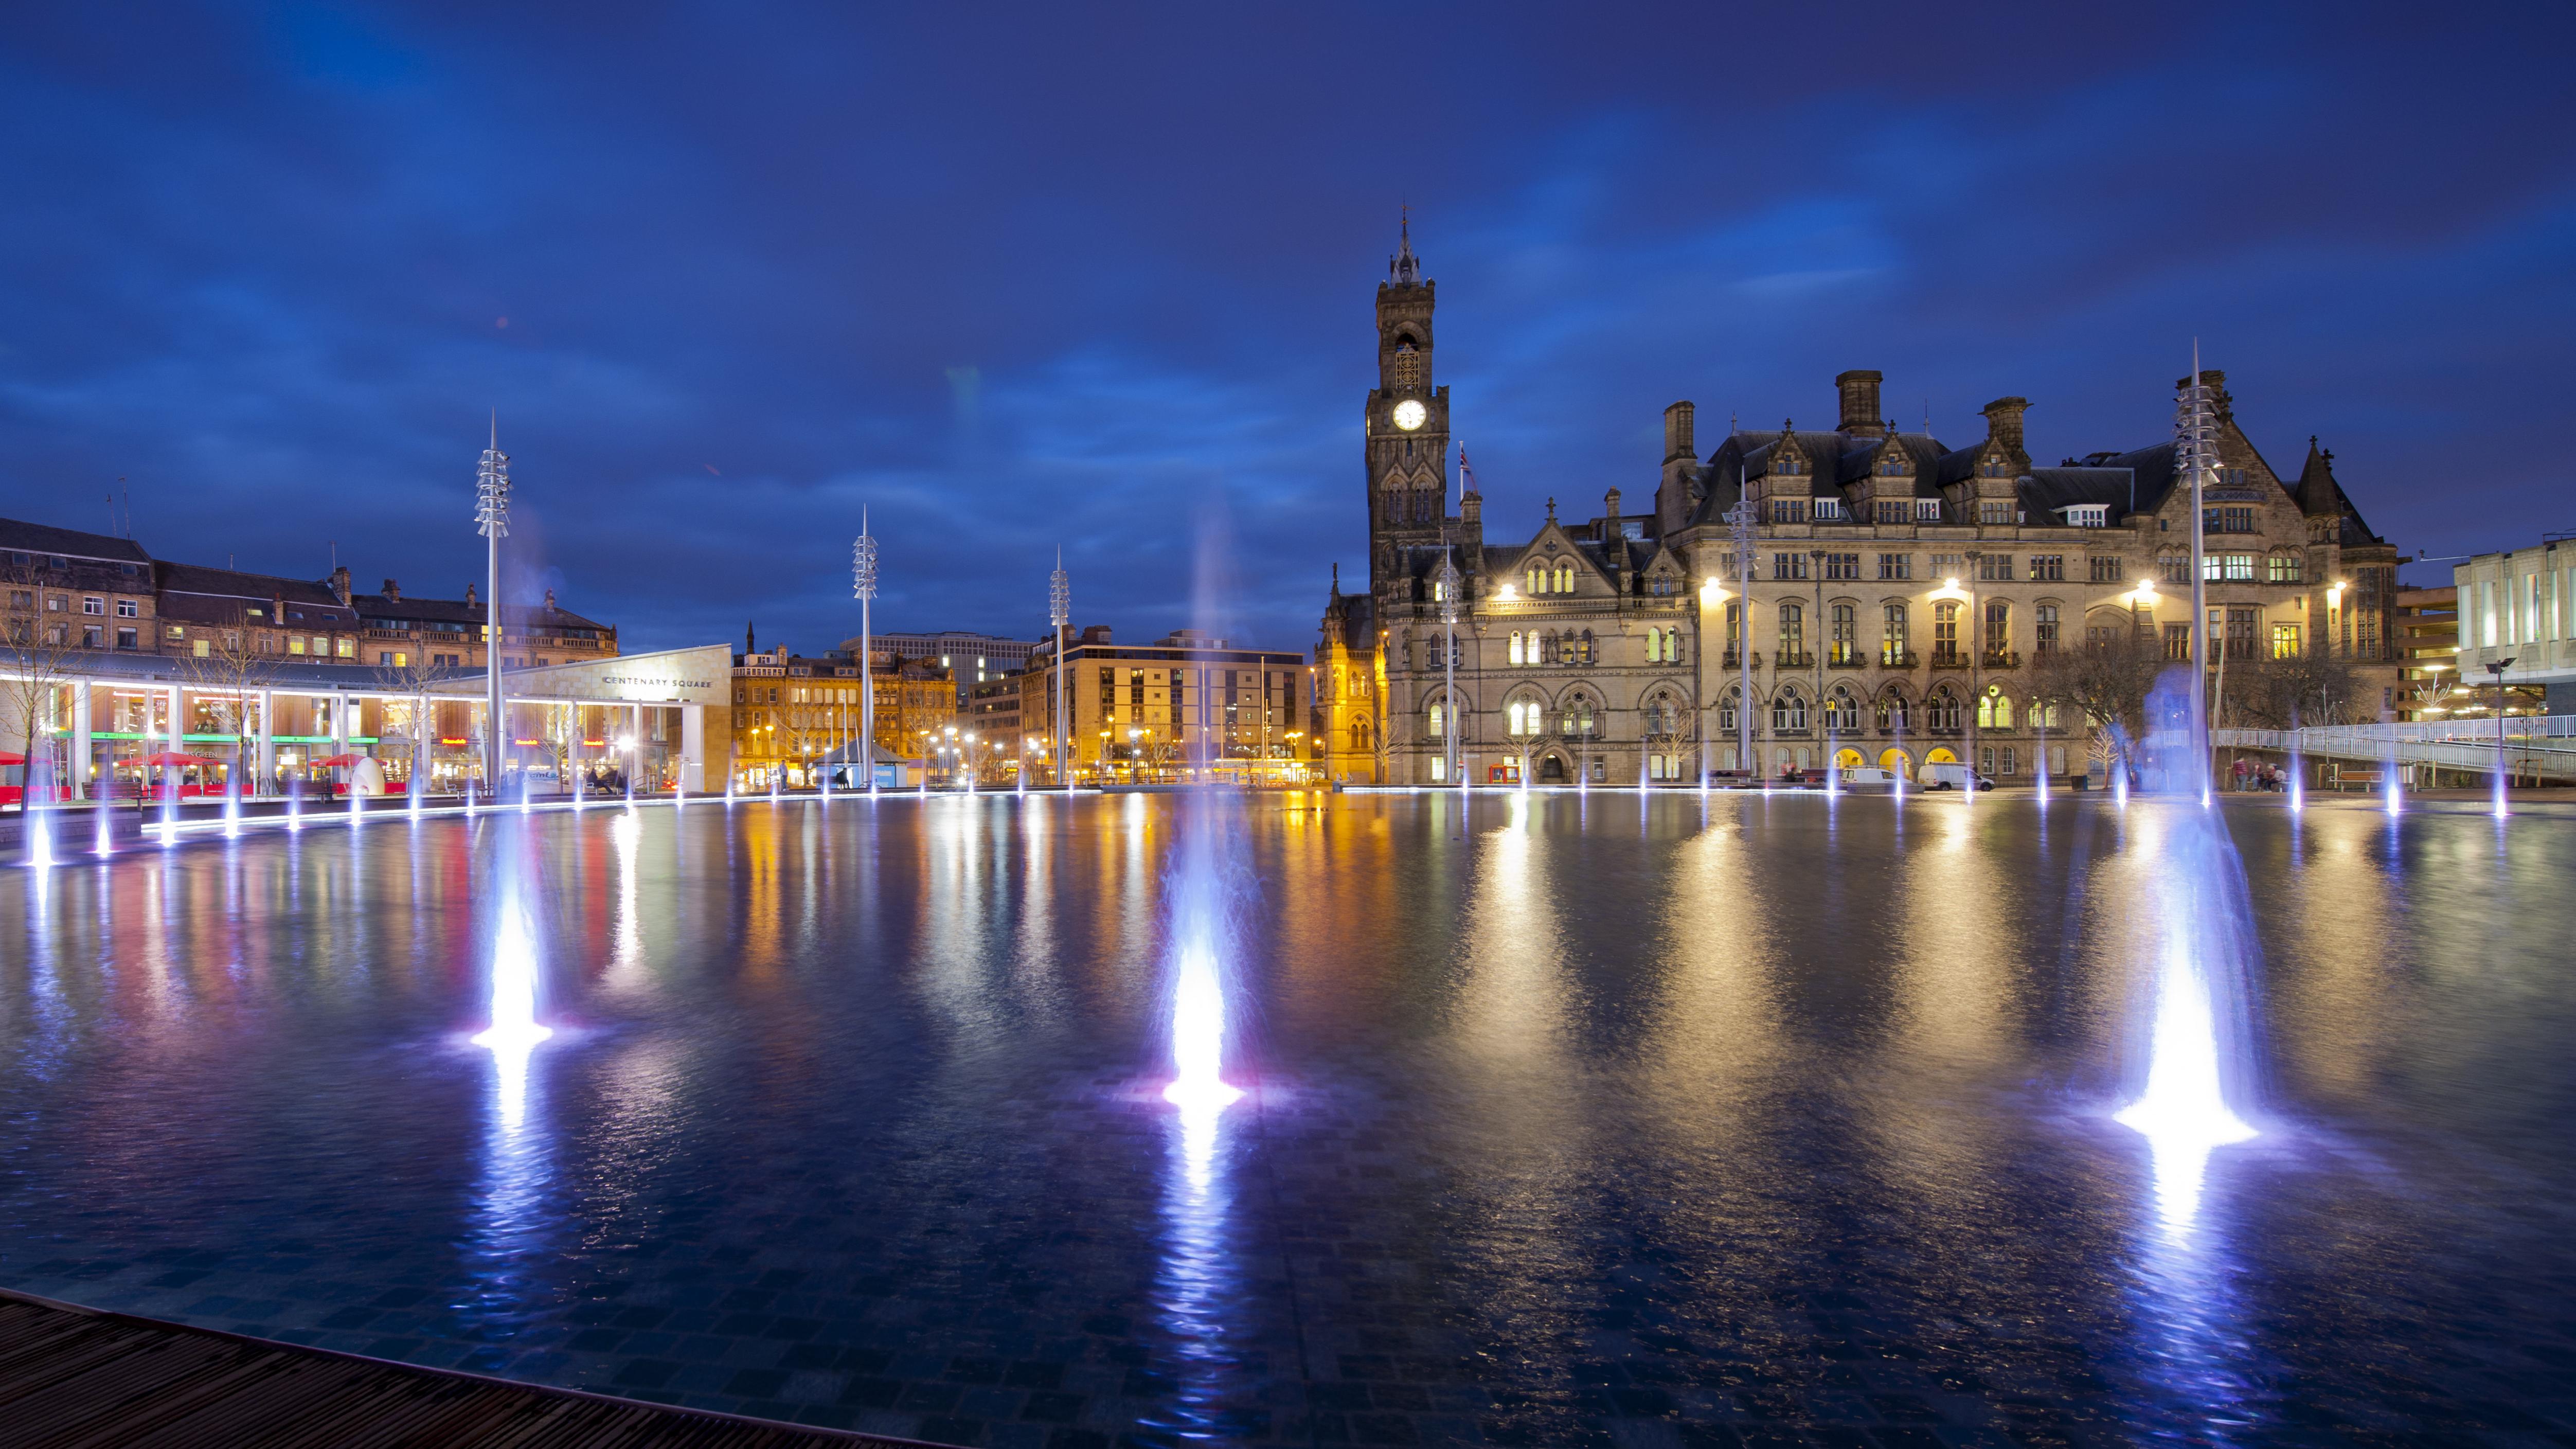 Bradford City Park Mirror Pool